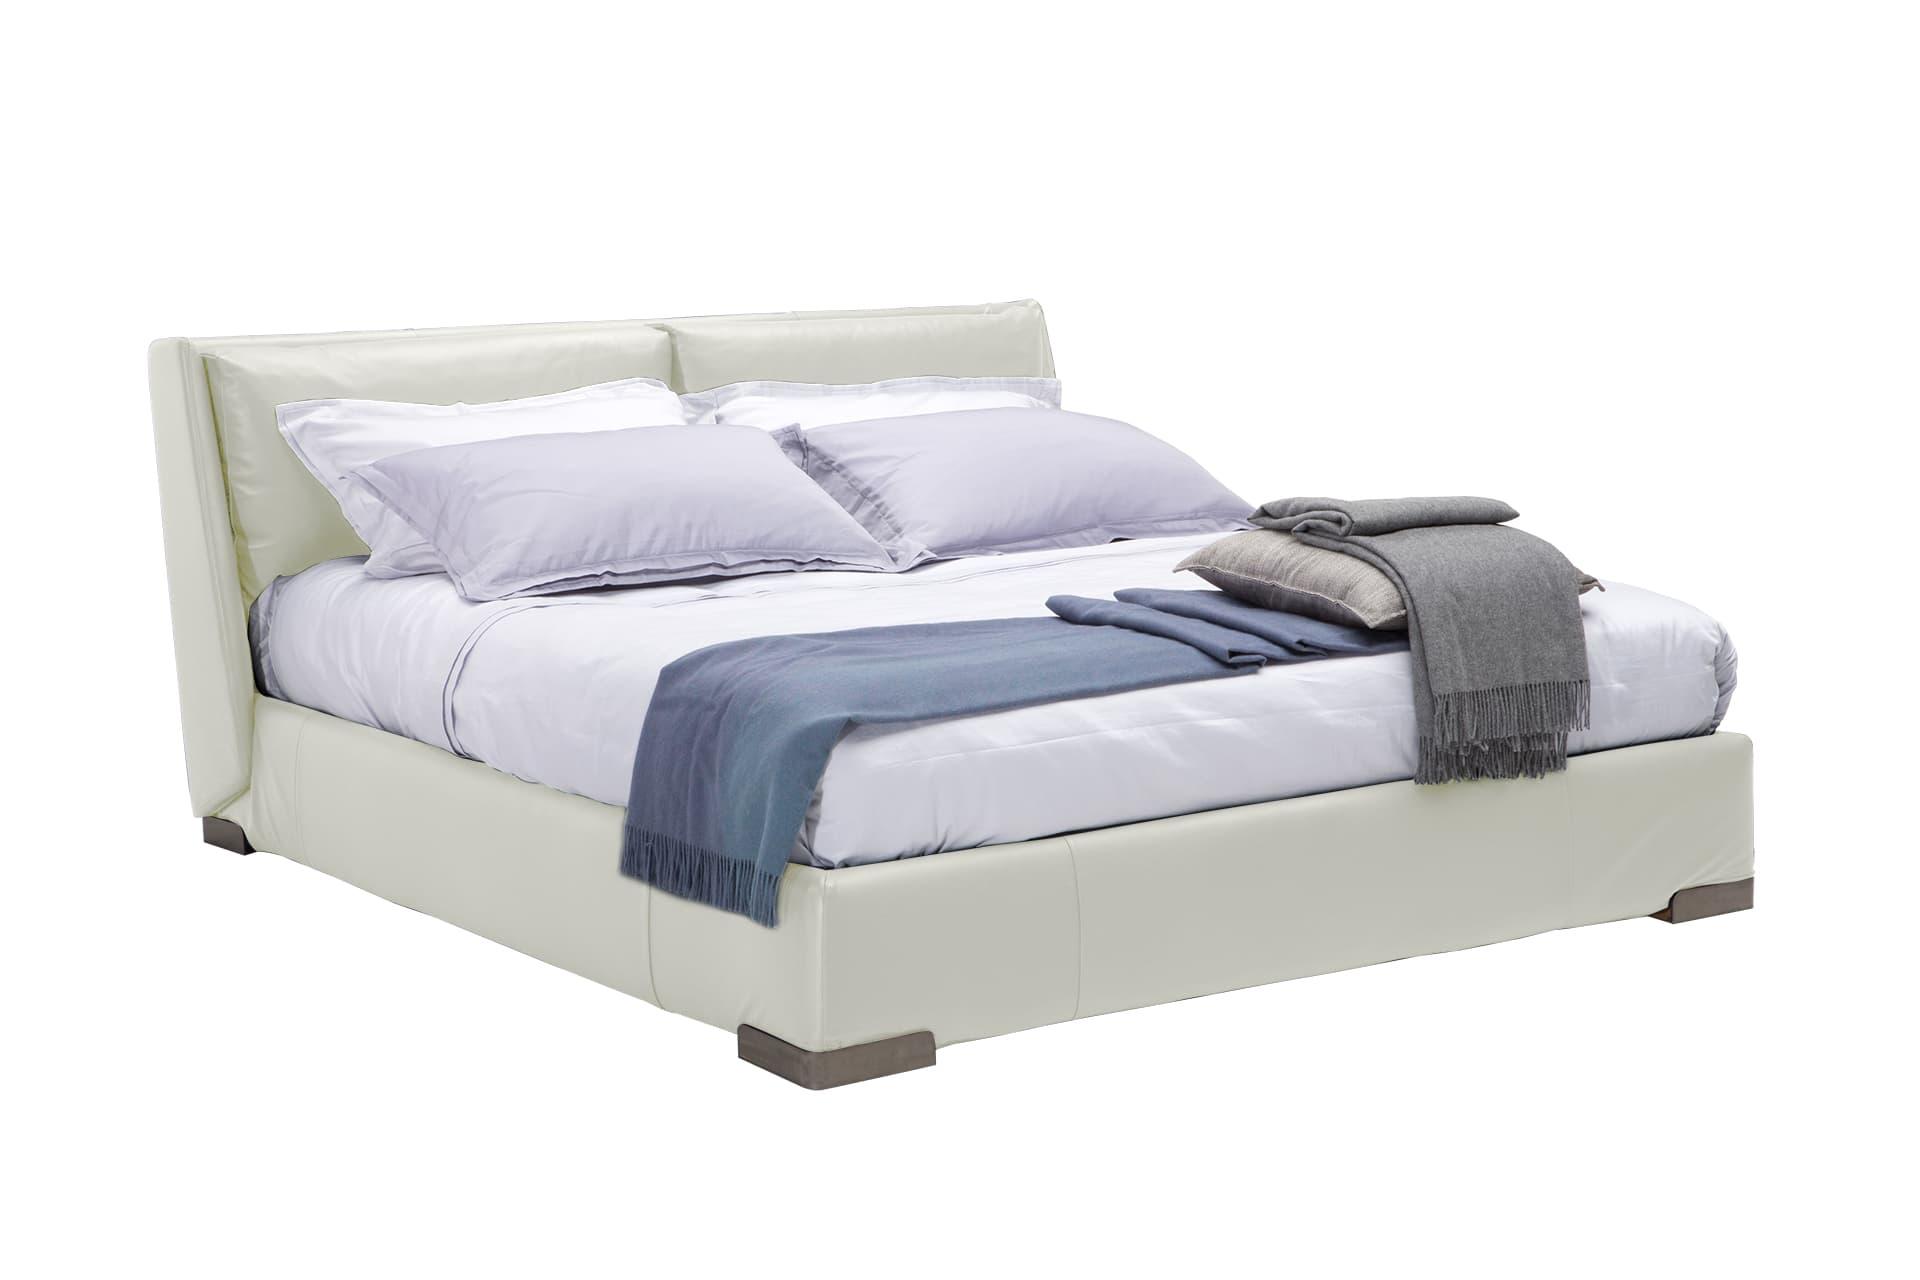 Natuzzi Italia Fenice Bed 2509